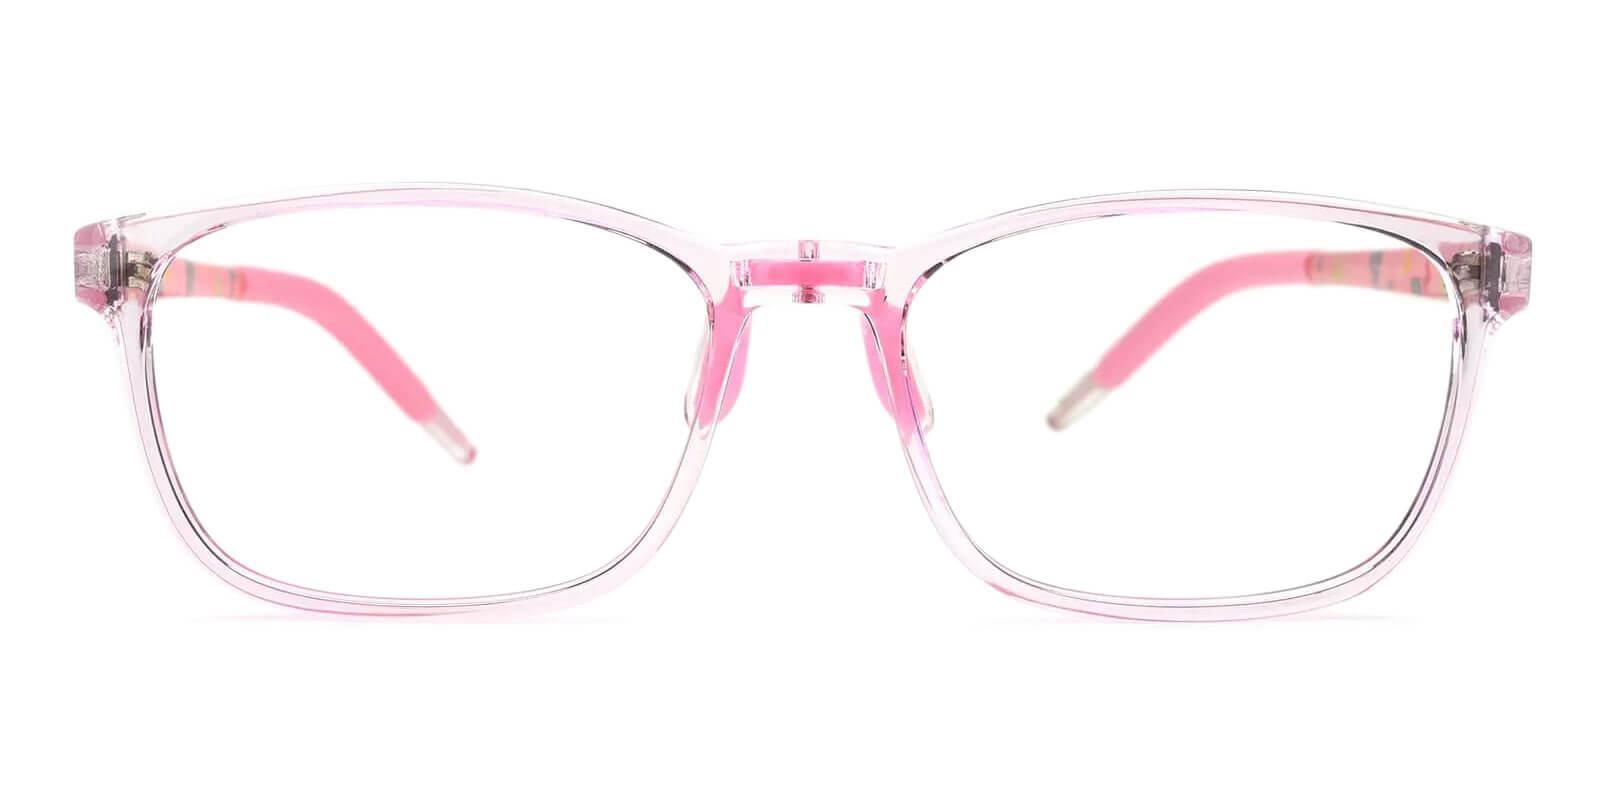 Kids-Sparkle Pink Acetate , TR Eyeglasses , Lightweight , NosePads , UniversalBridgeFit Frames from ABBE Glasses